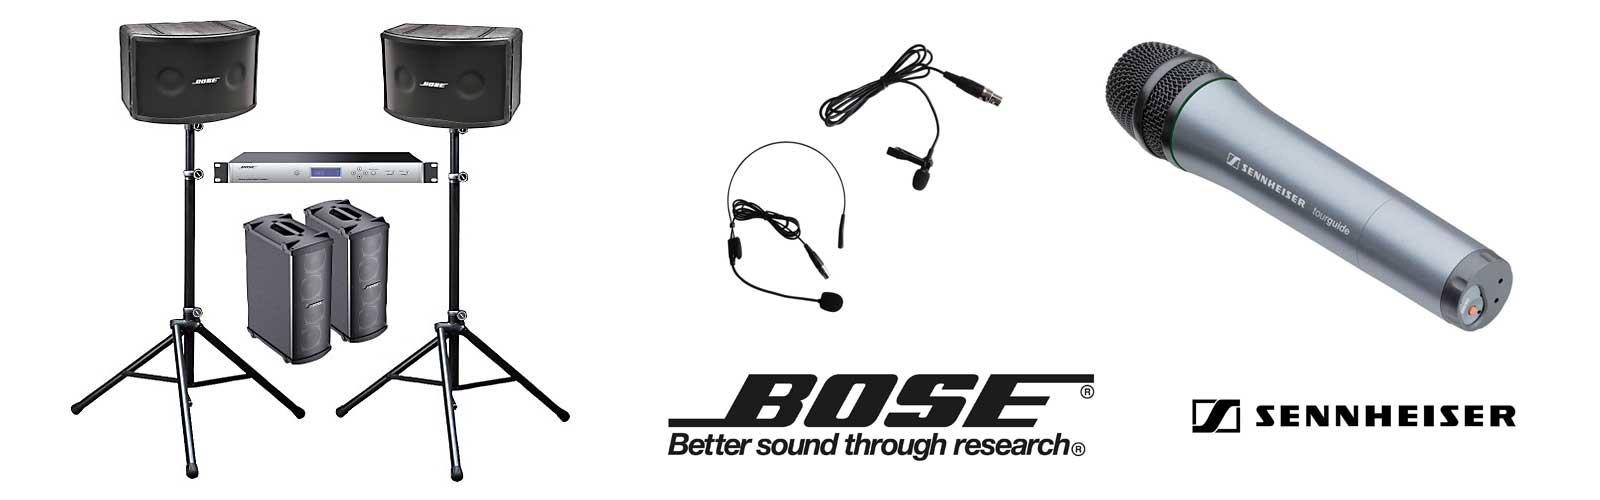 Bose-verhuur-professionale-geluidsset-comp